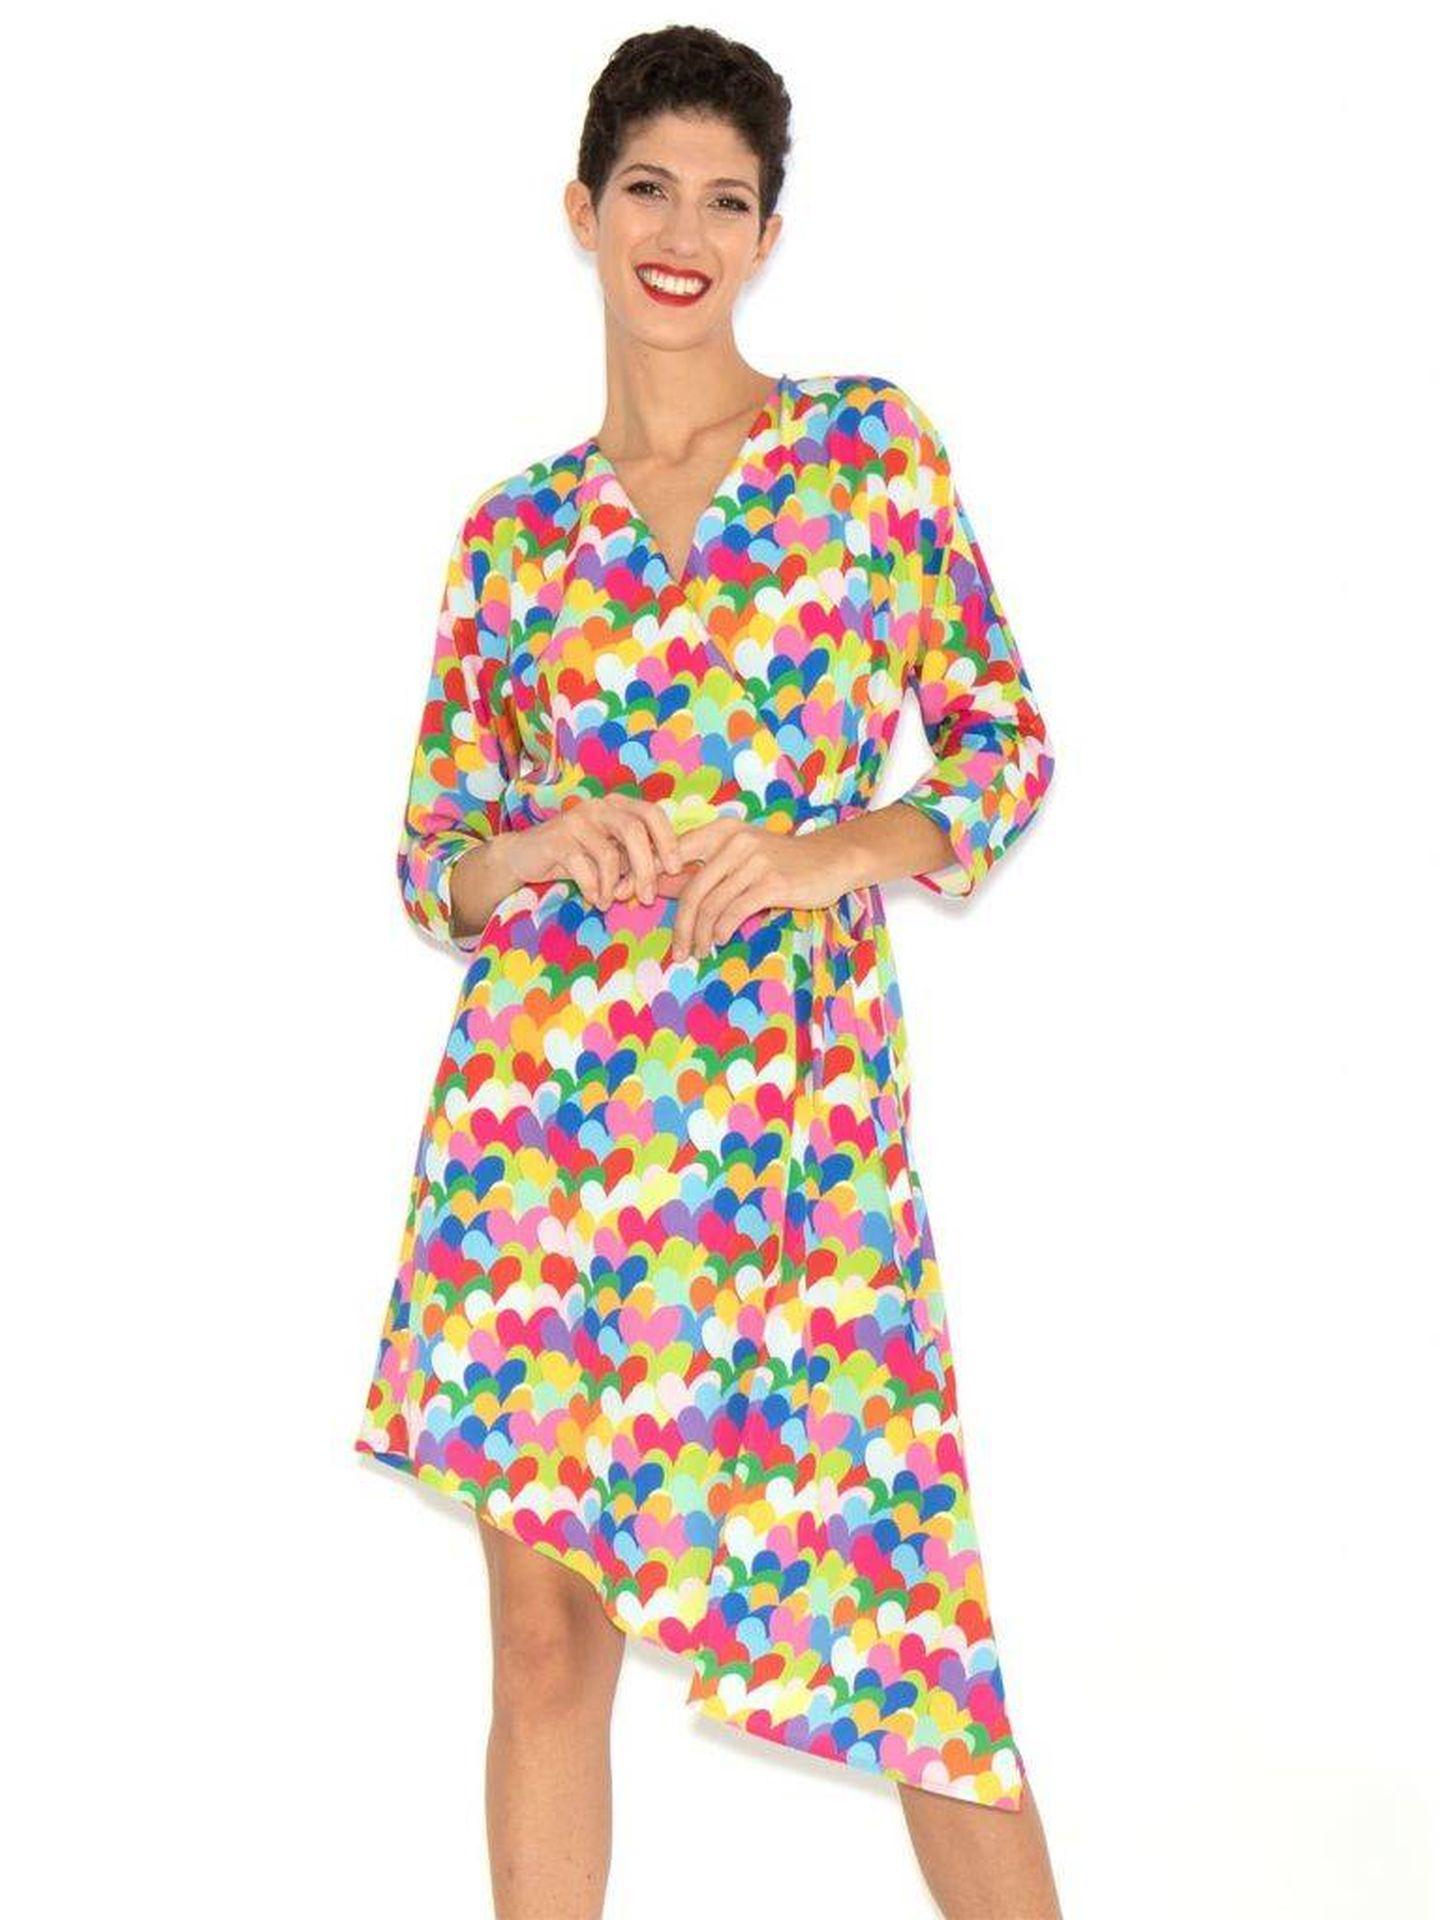 Vestido de Agatha Ruiz de la Prada. (59,95 euros)